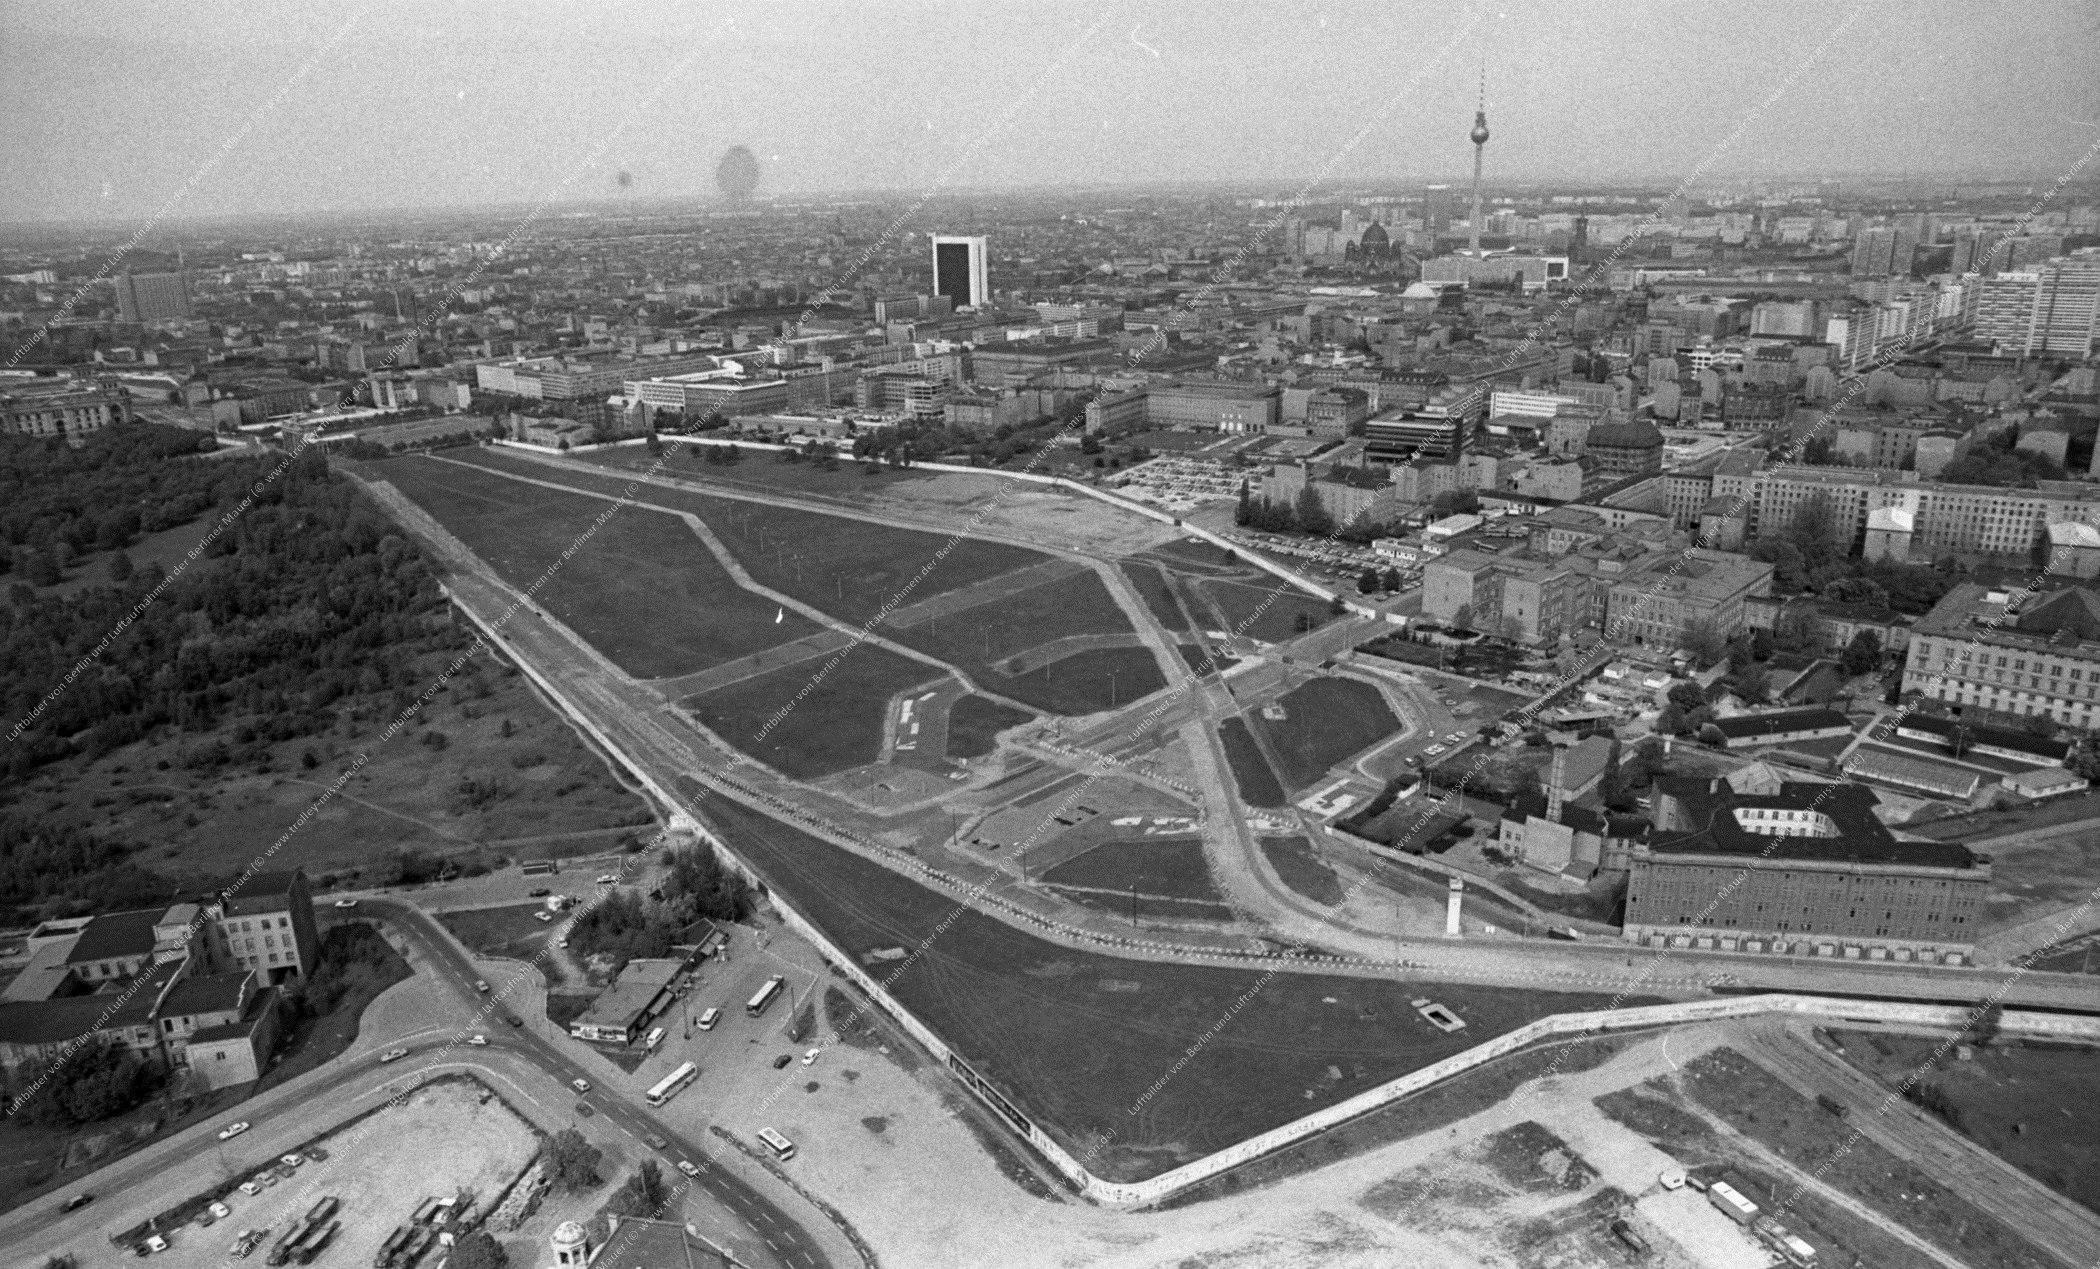 Berlin Luftbild Potsdamer Platz vom 12. Mai 1982 (Bild 090)